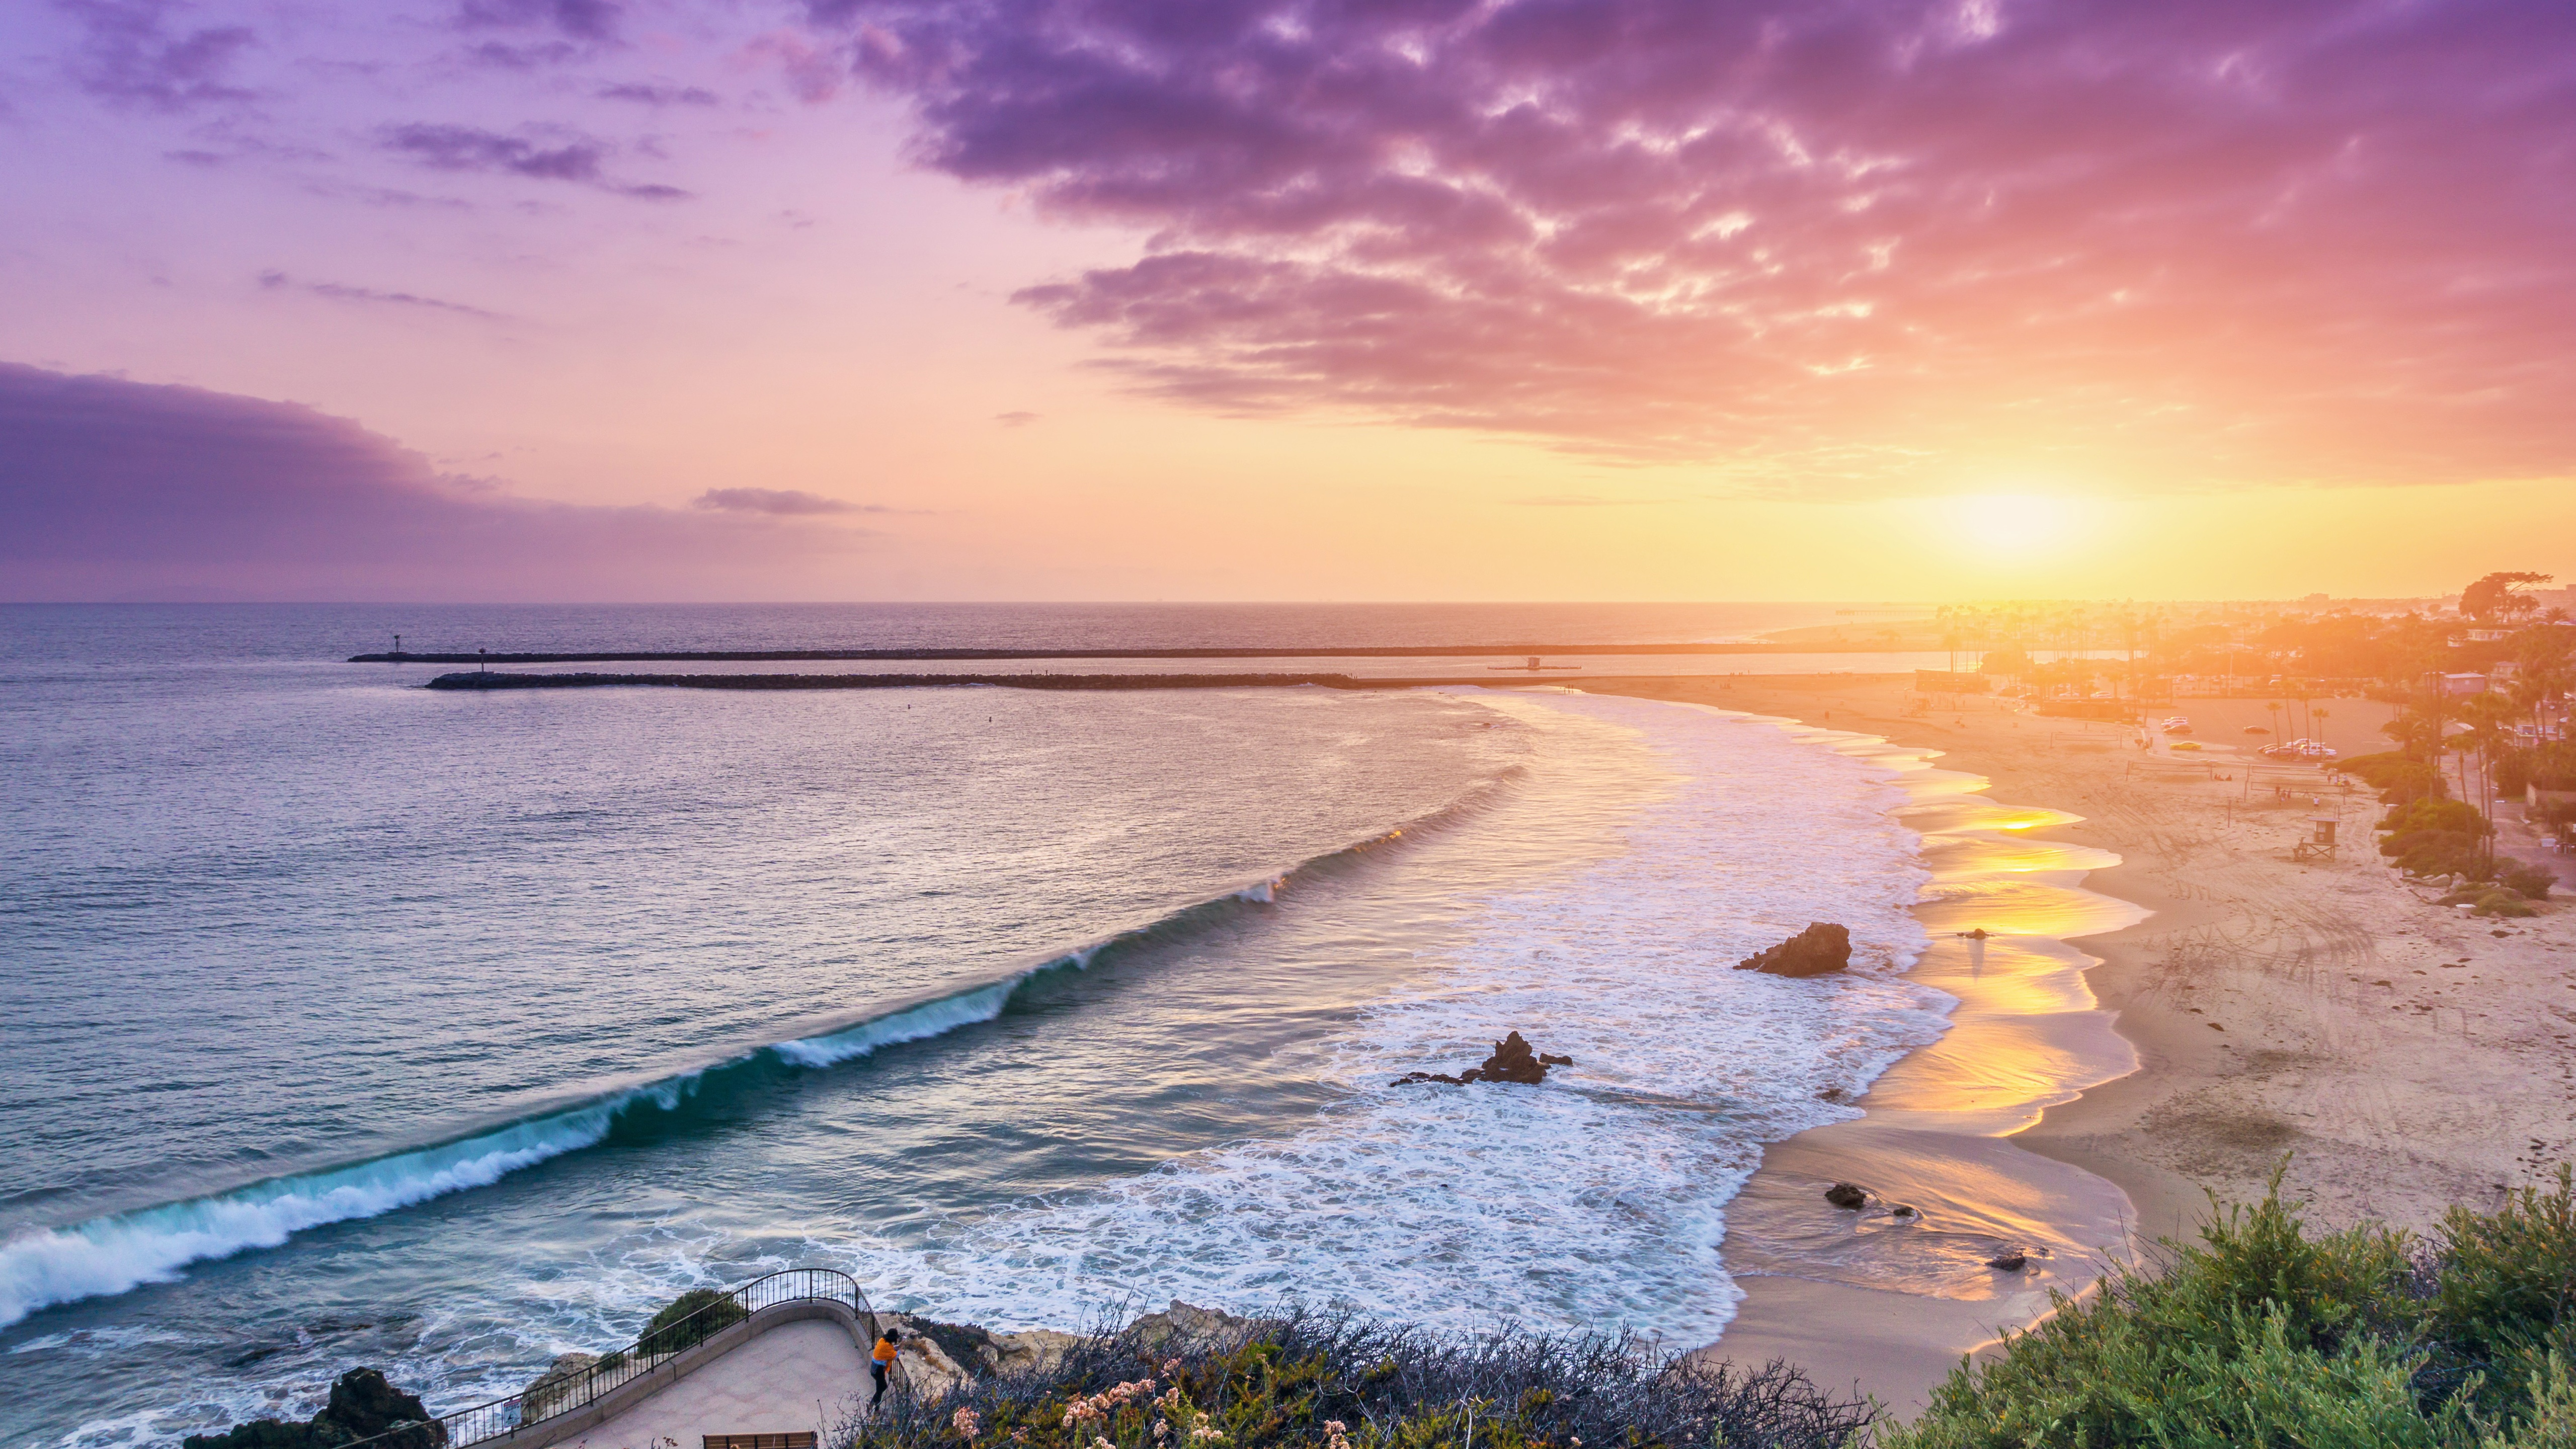 Corona Del Mar Newport Beach 5k Hd Nature 4k Wallpapers